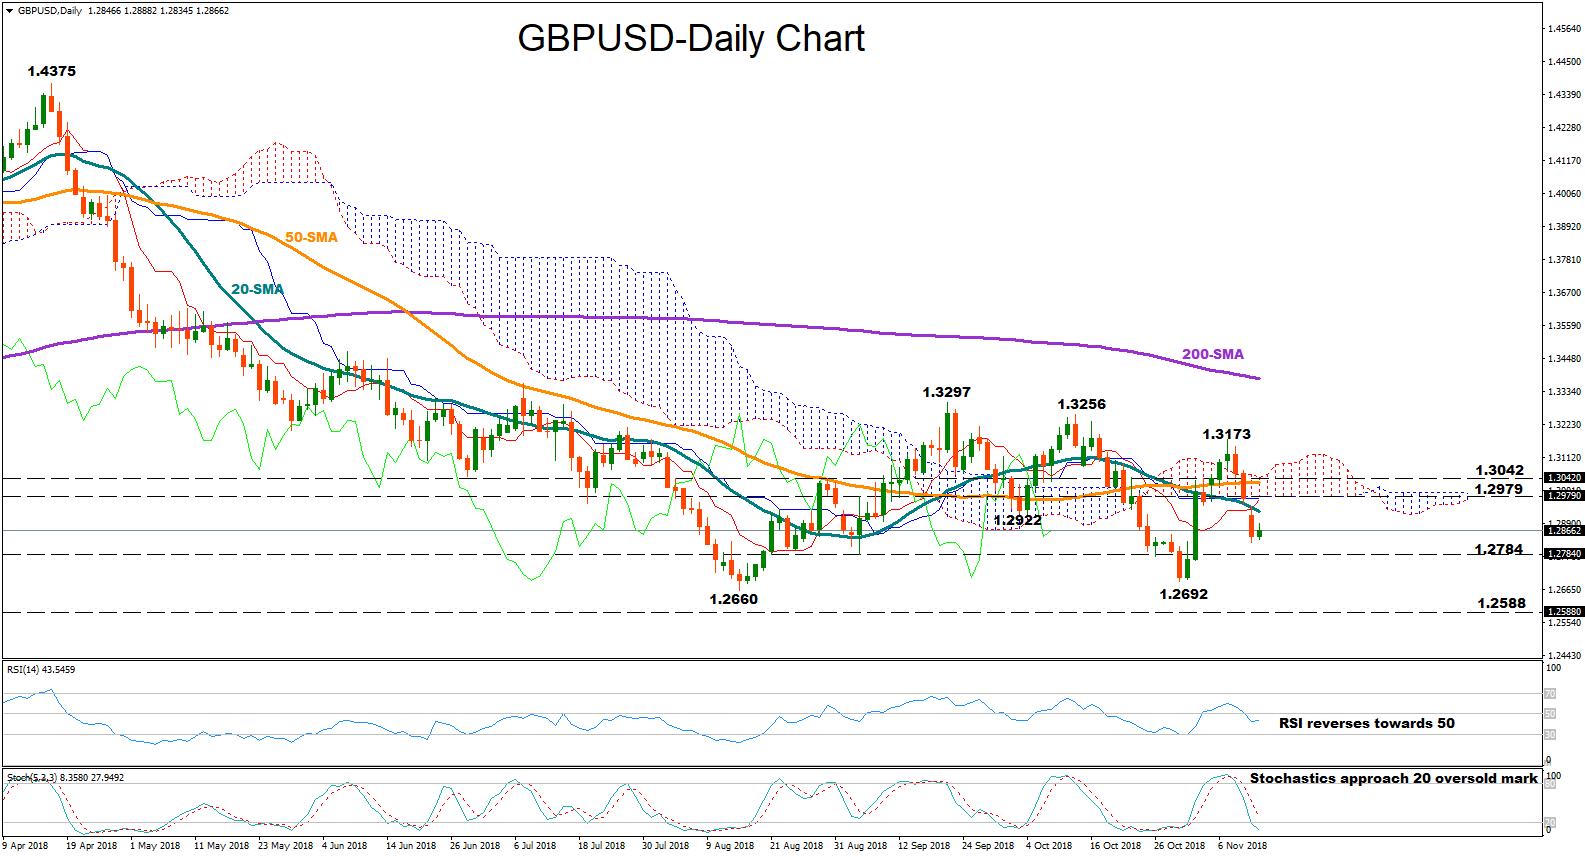 GBP/USD 13Nov18 | EconAlerts